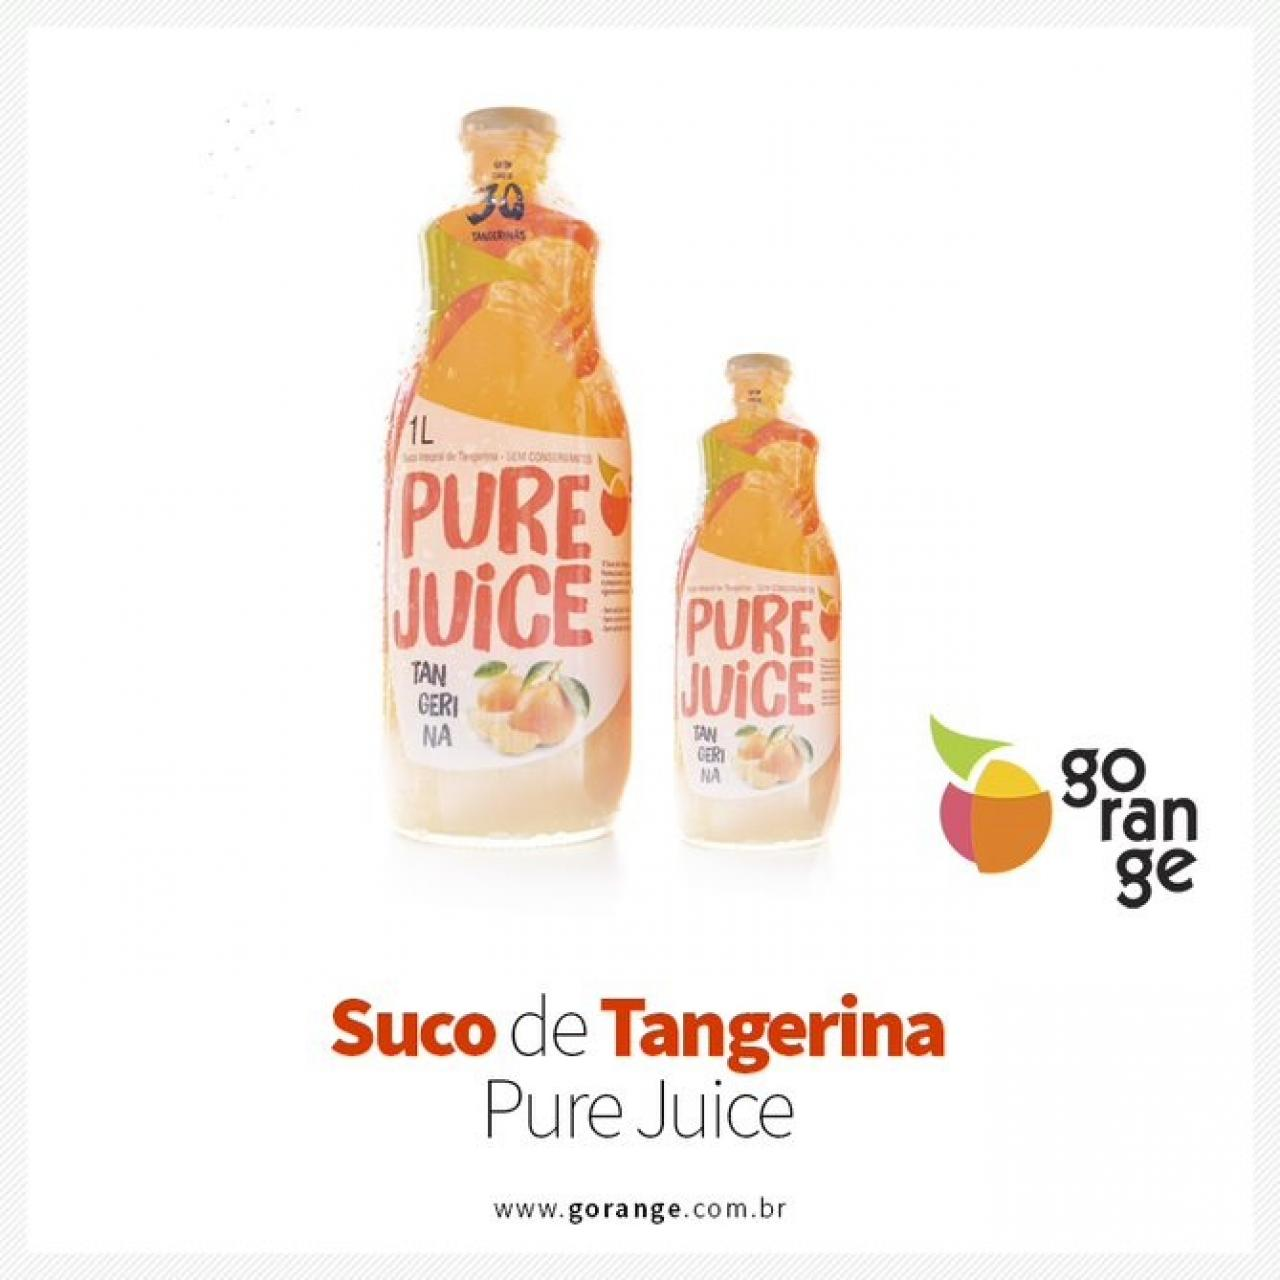 Suco de Tangerina Integral Pure Juice